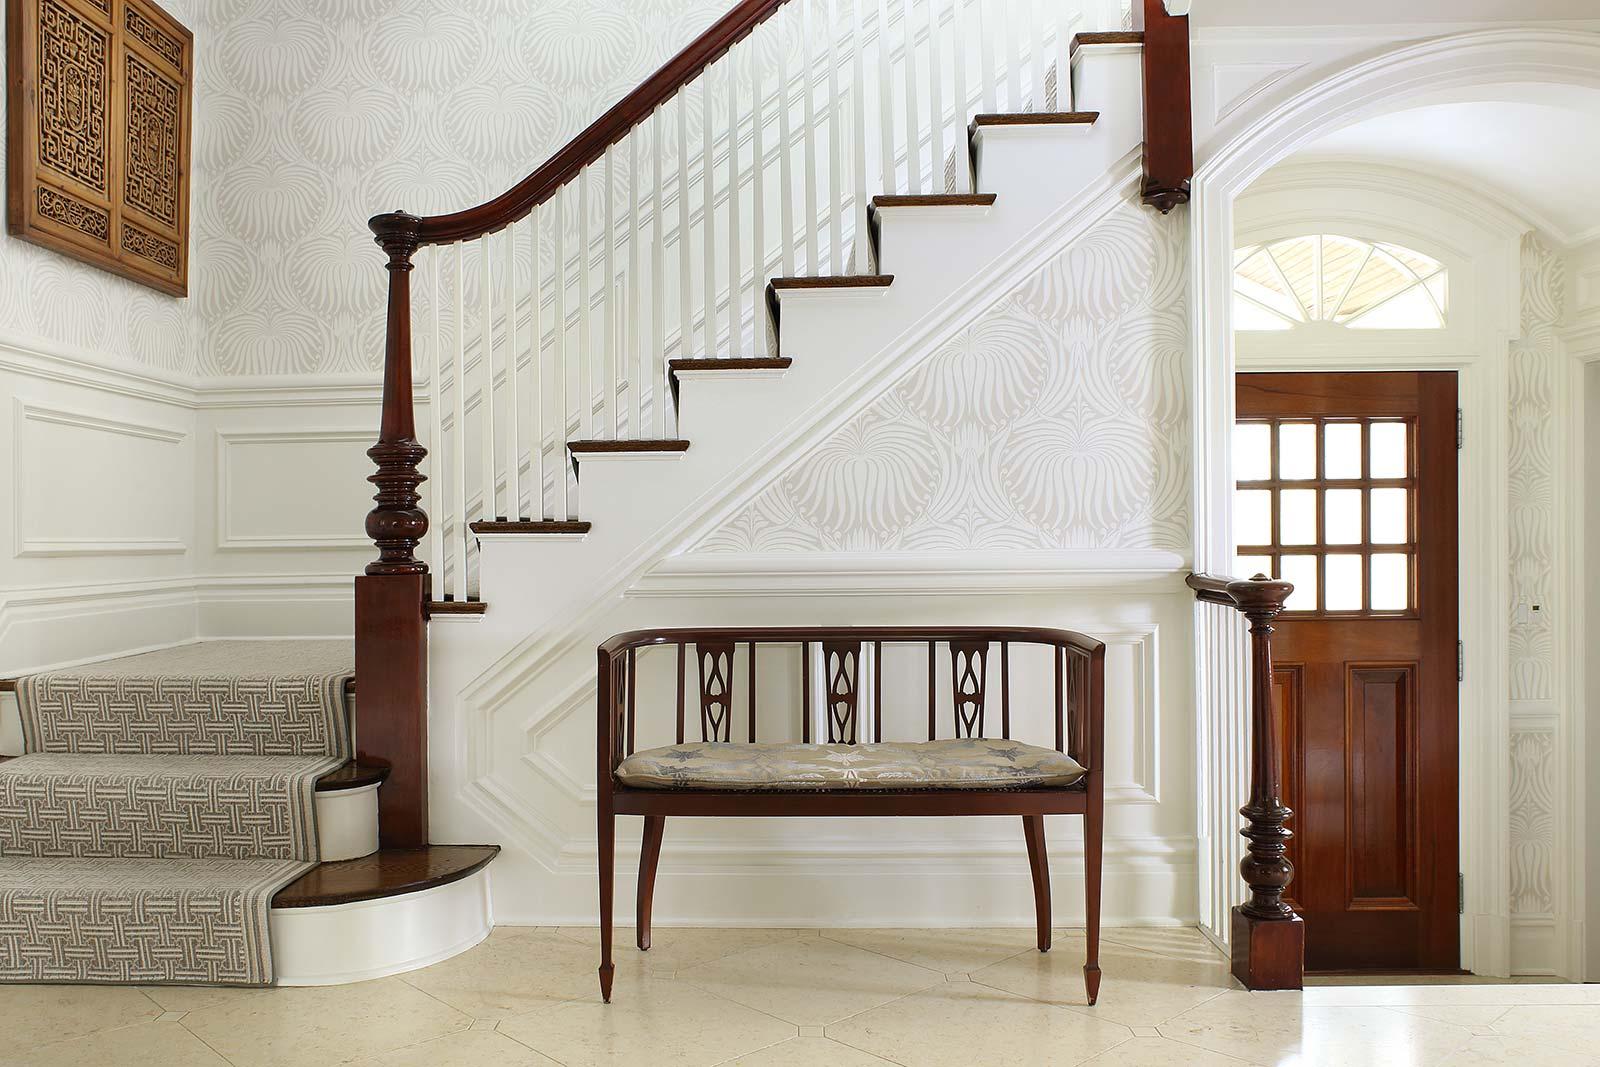 Foyer-Seat-under-stairs-front-door & Foyer-Seat-under-stairs-front-door | Valerie Grant Interiors